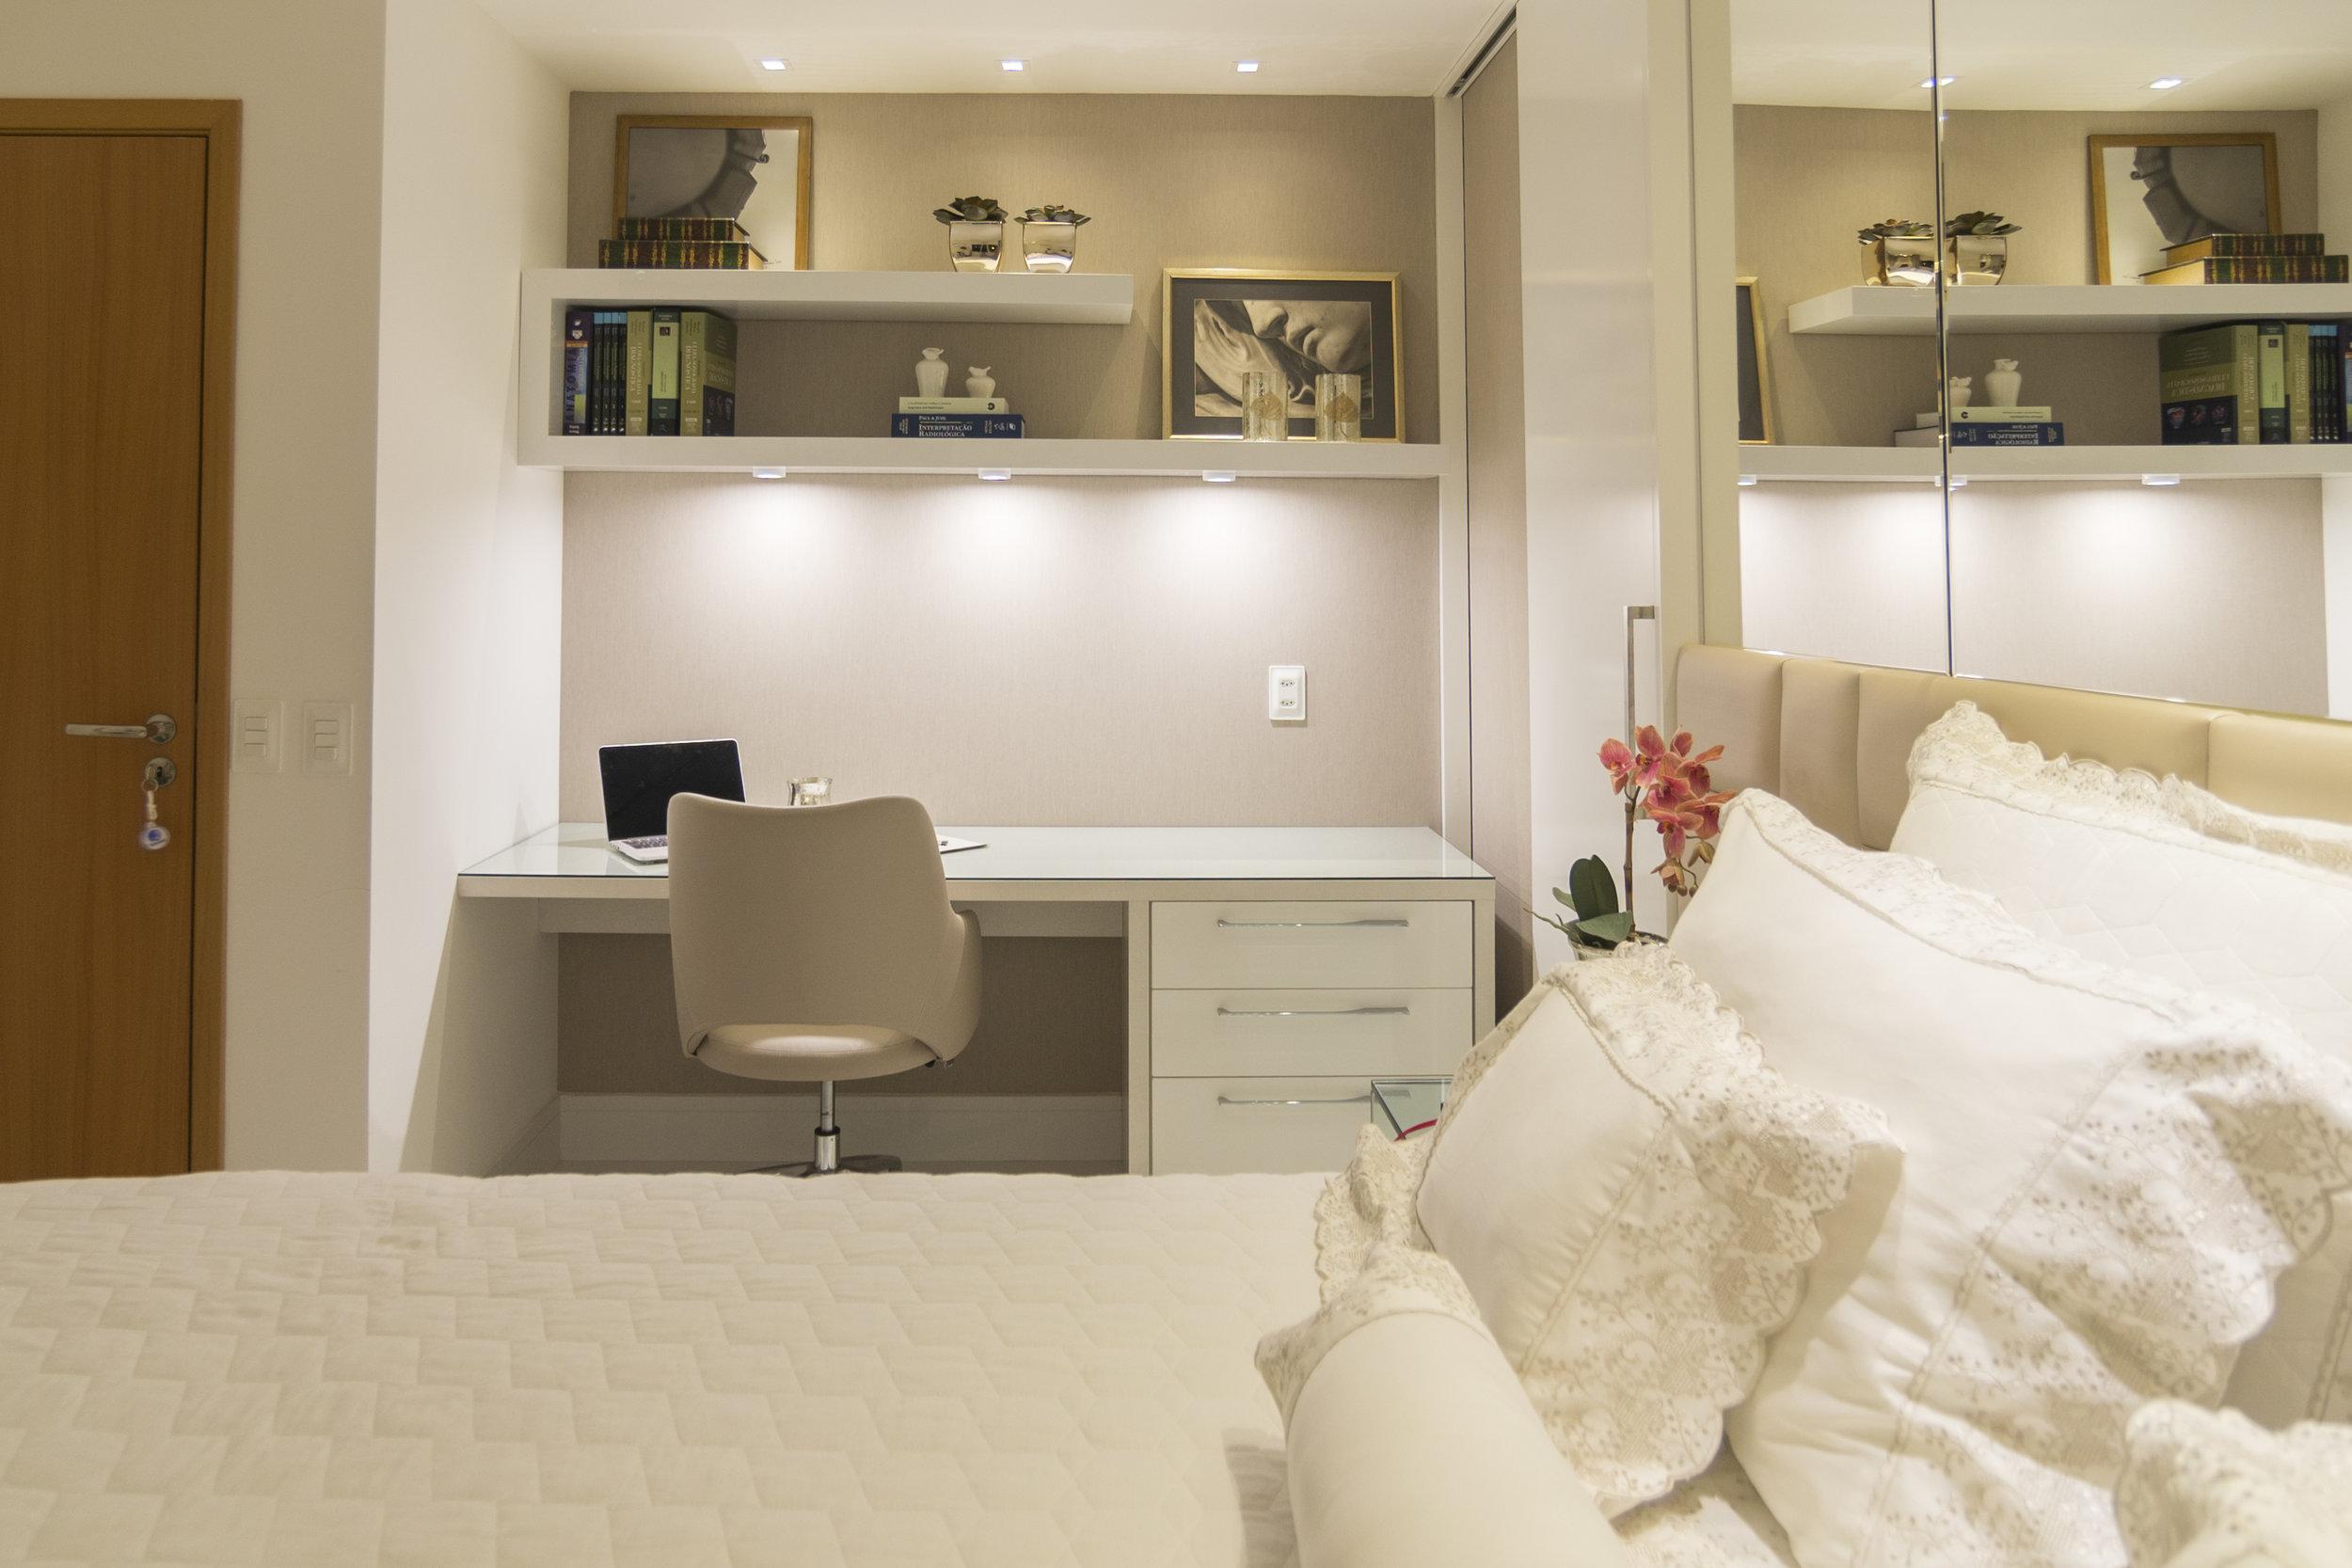 projeto-arquitetonico-robertoindira-duo-arquitetura-apartamentos-quarto-01.jpg